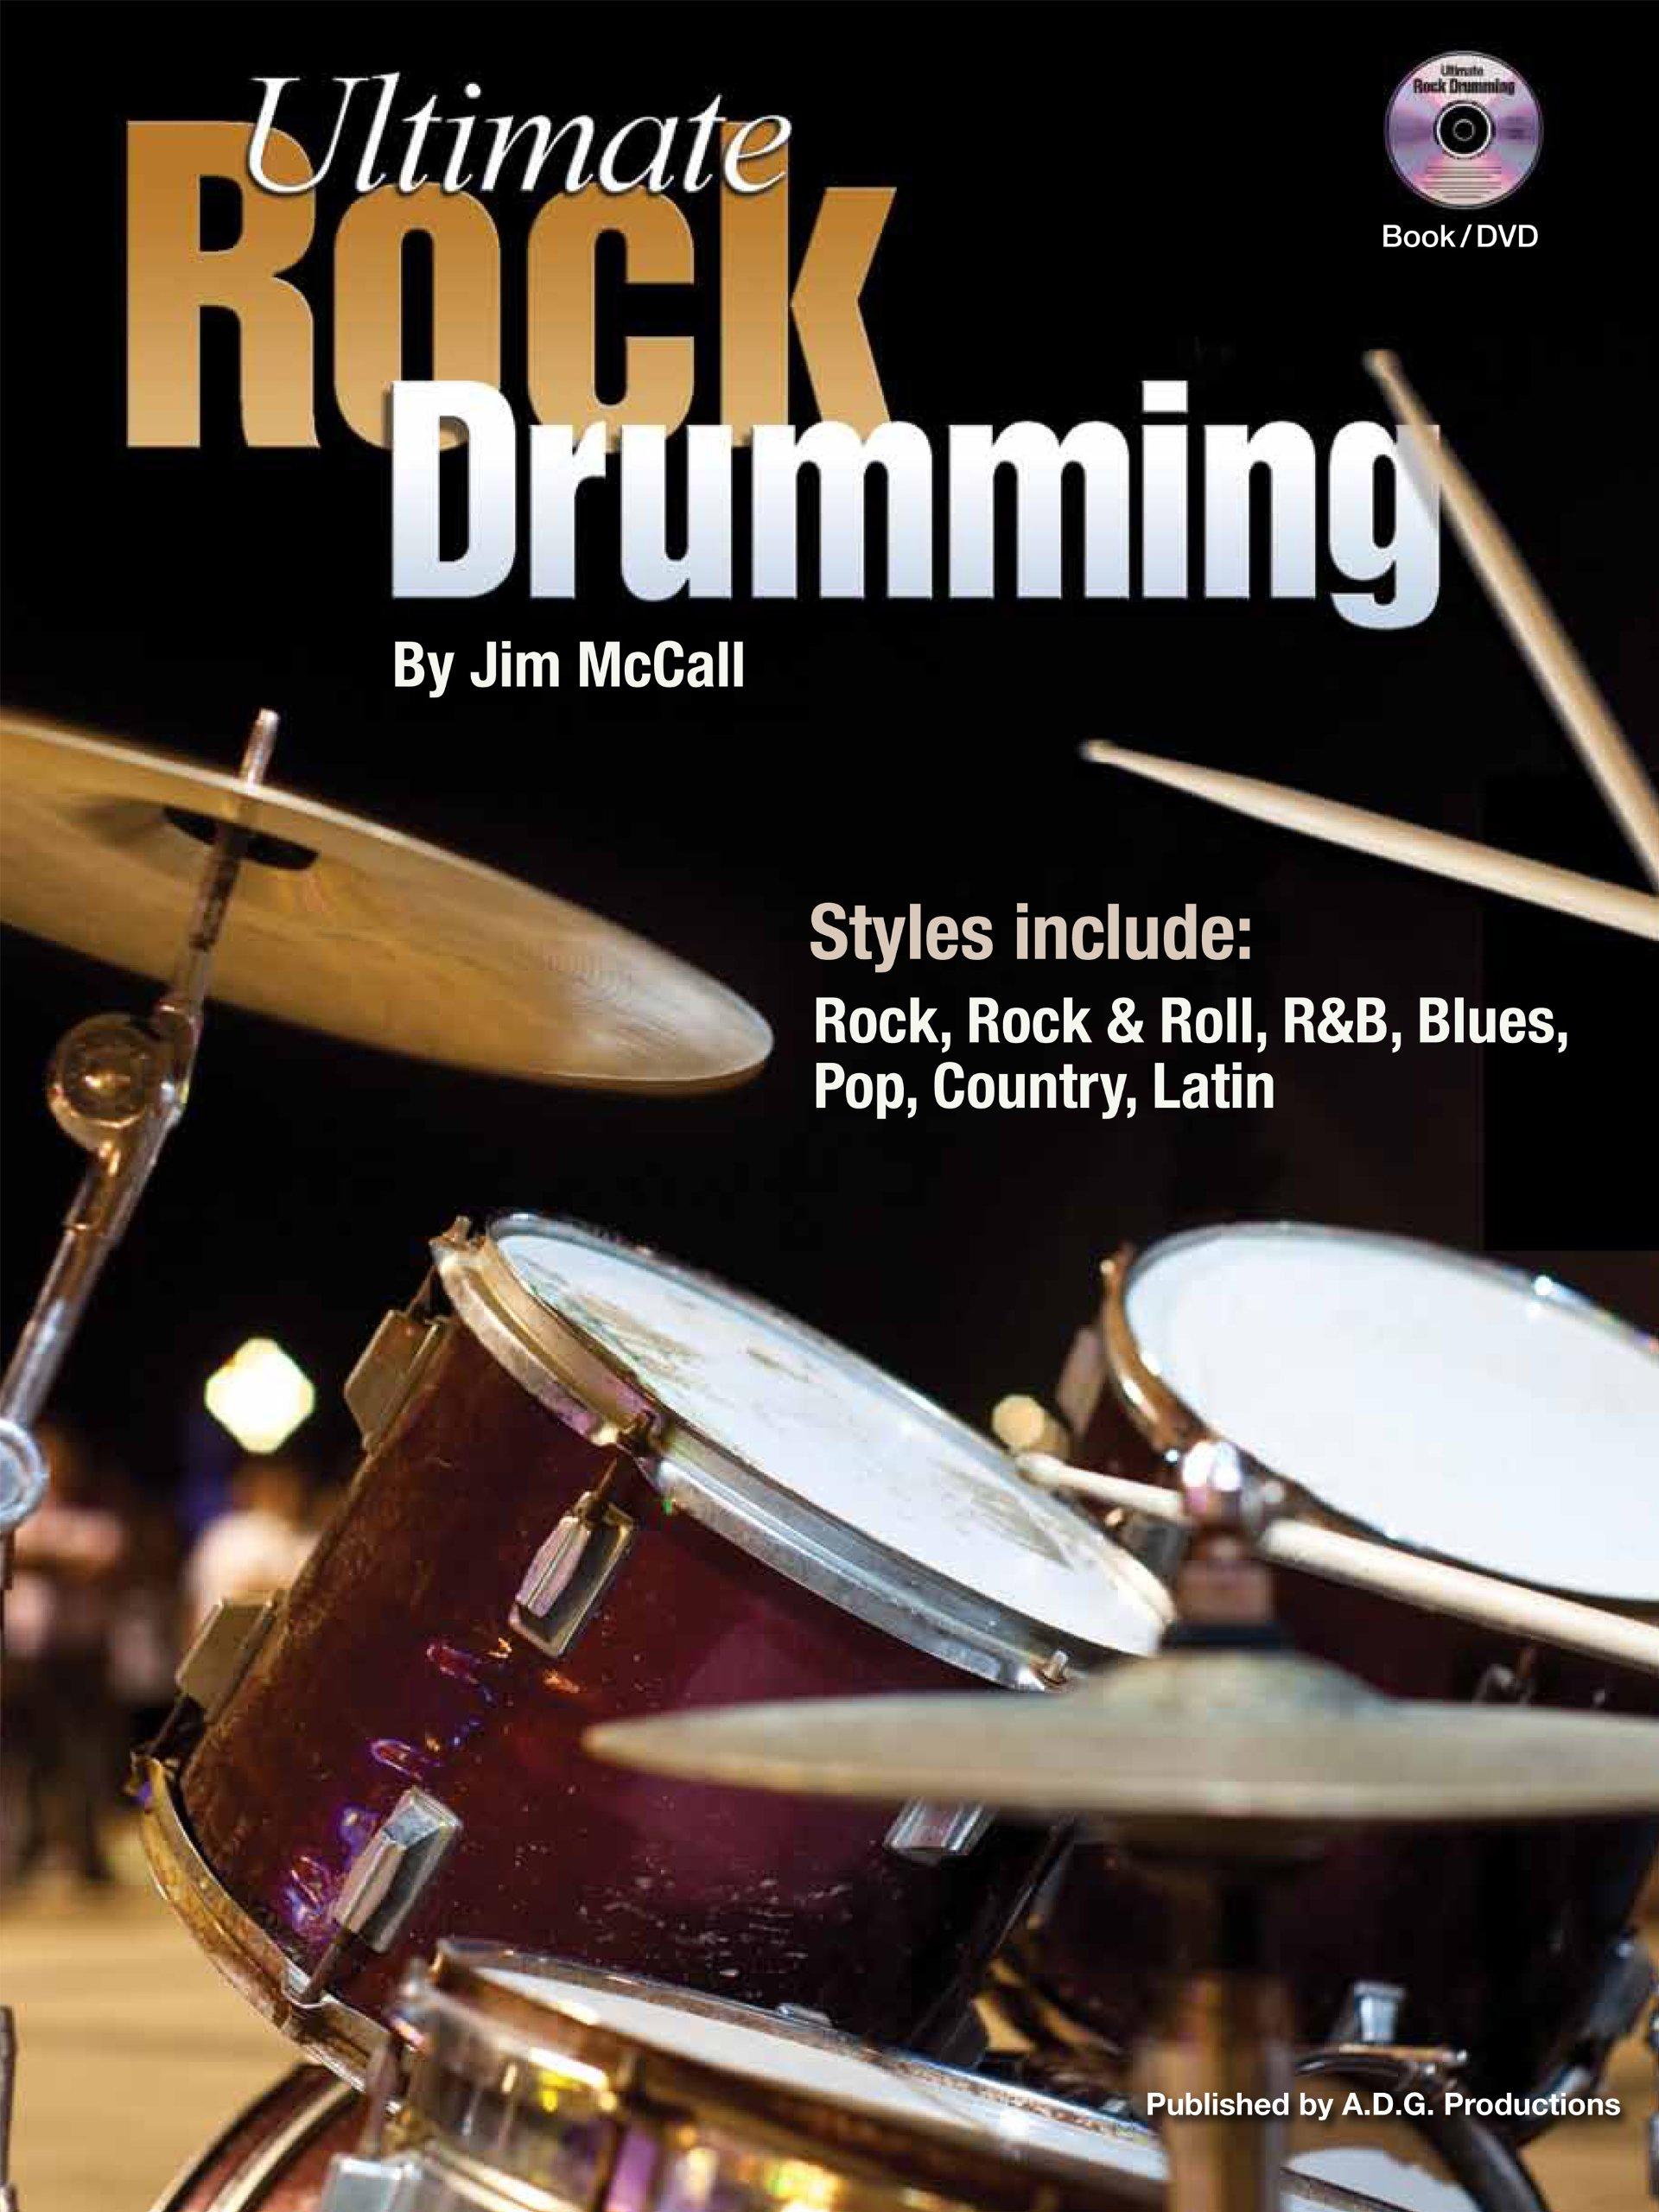 Ultimate Rock Drumming Book/DVD ebook